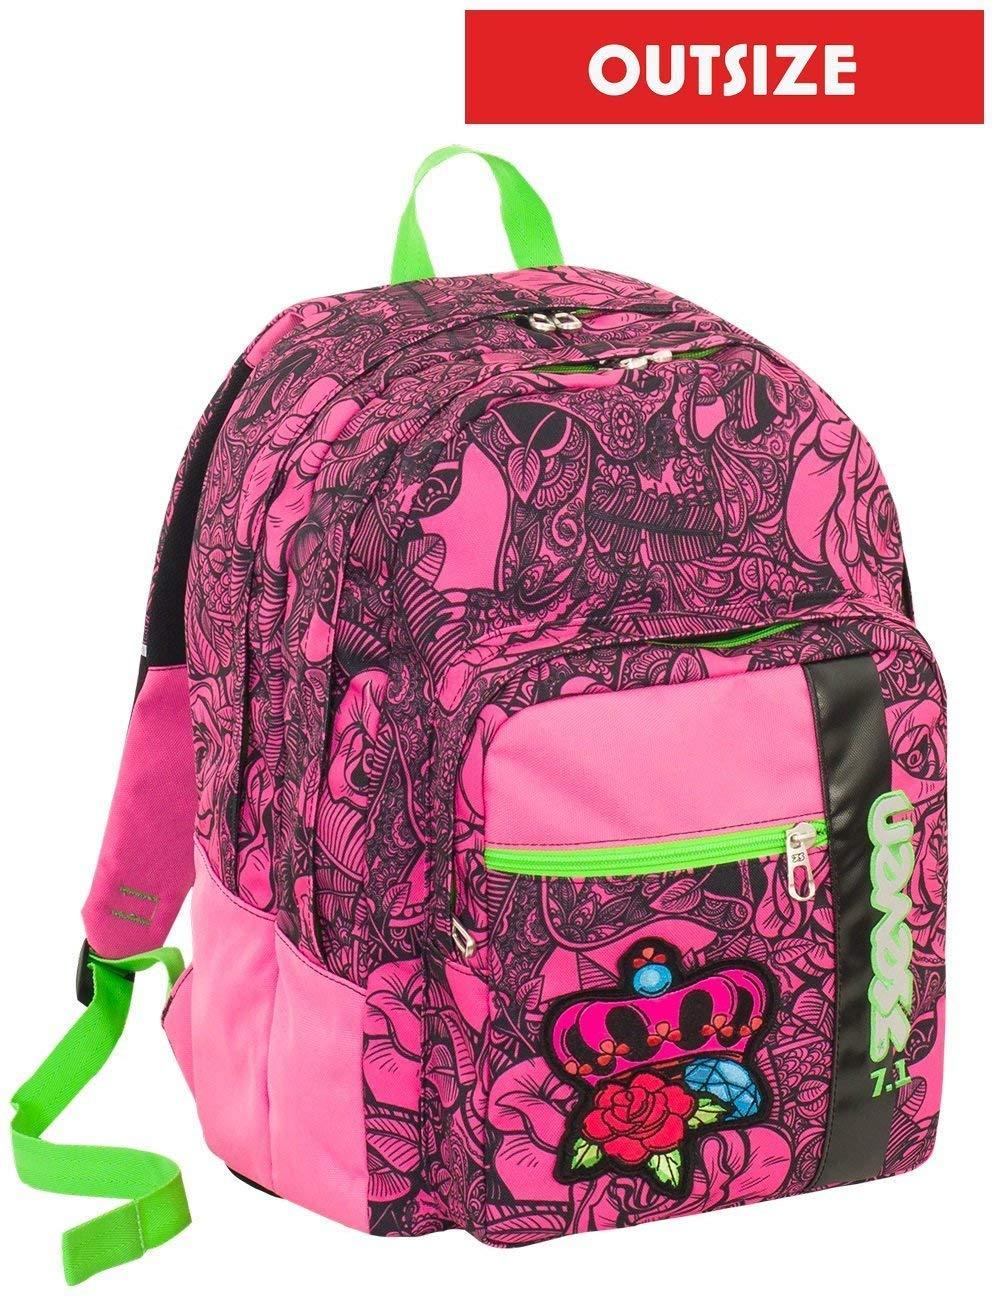 SEVEN S.P.A. - Mochila infantil  Rosa SUMMER ROSE ROSE ROSE 0e8b1f